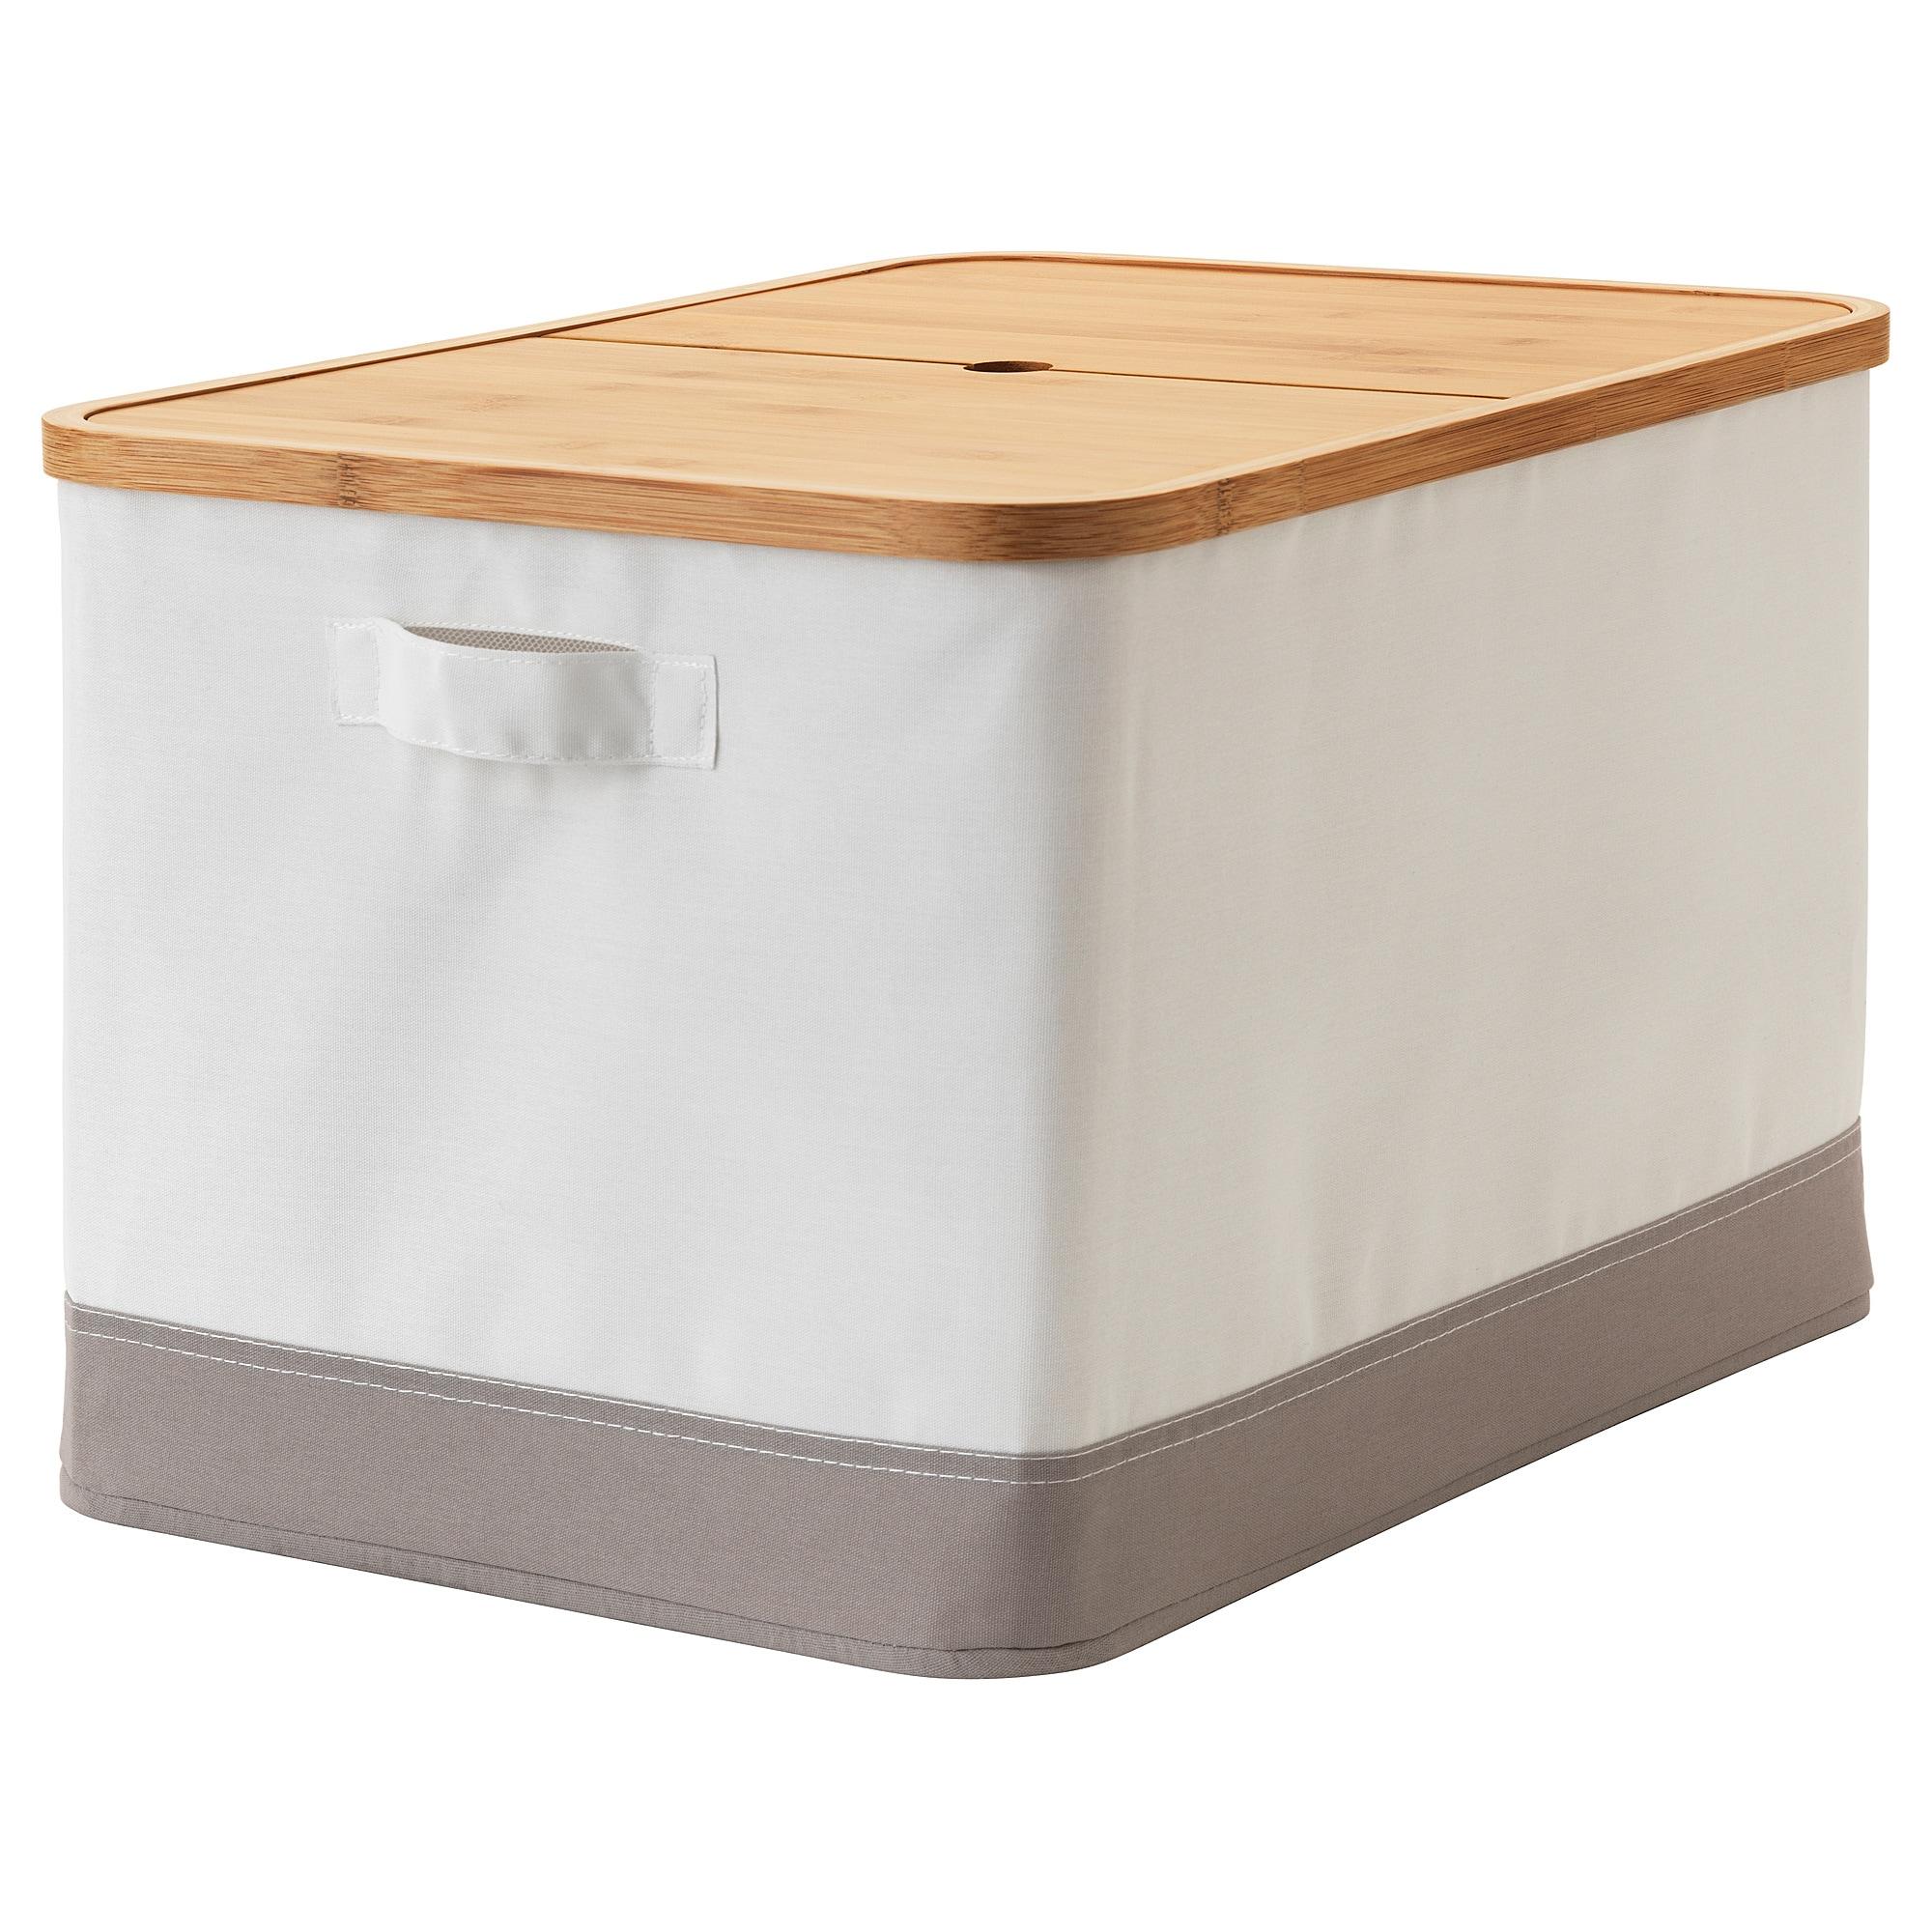 Rabbla Caja Con Tapa 35x50x30 Cm Cajas Almacenaje